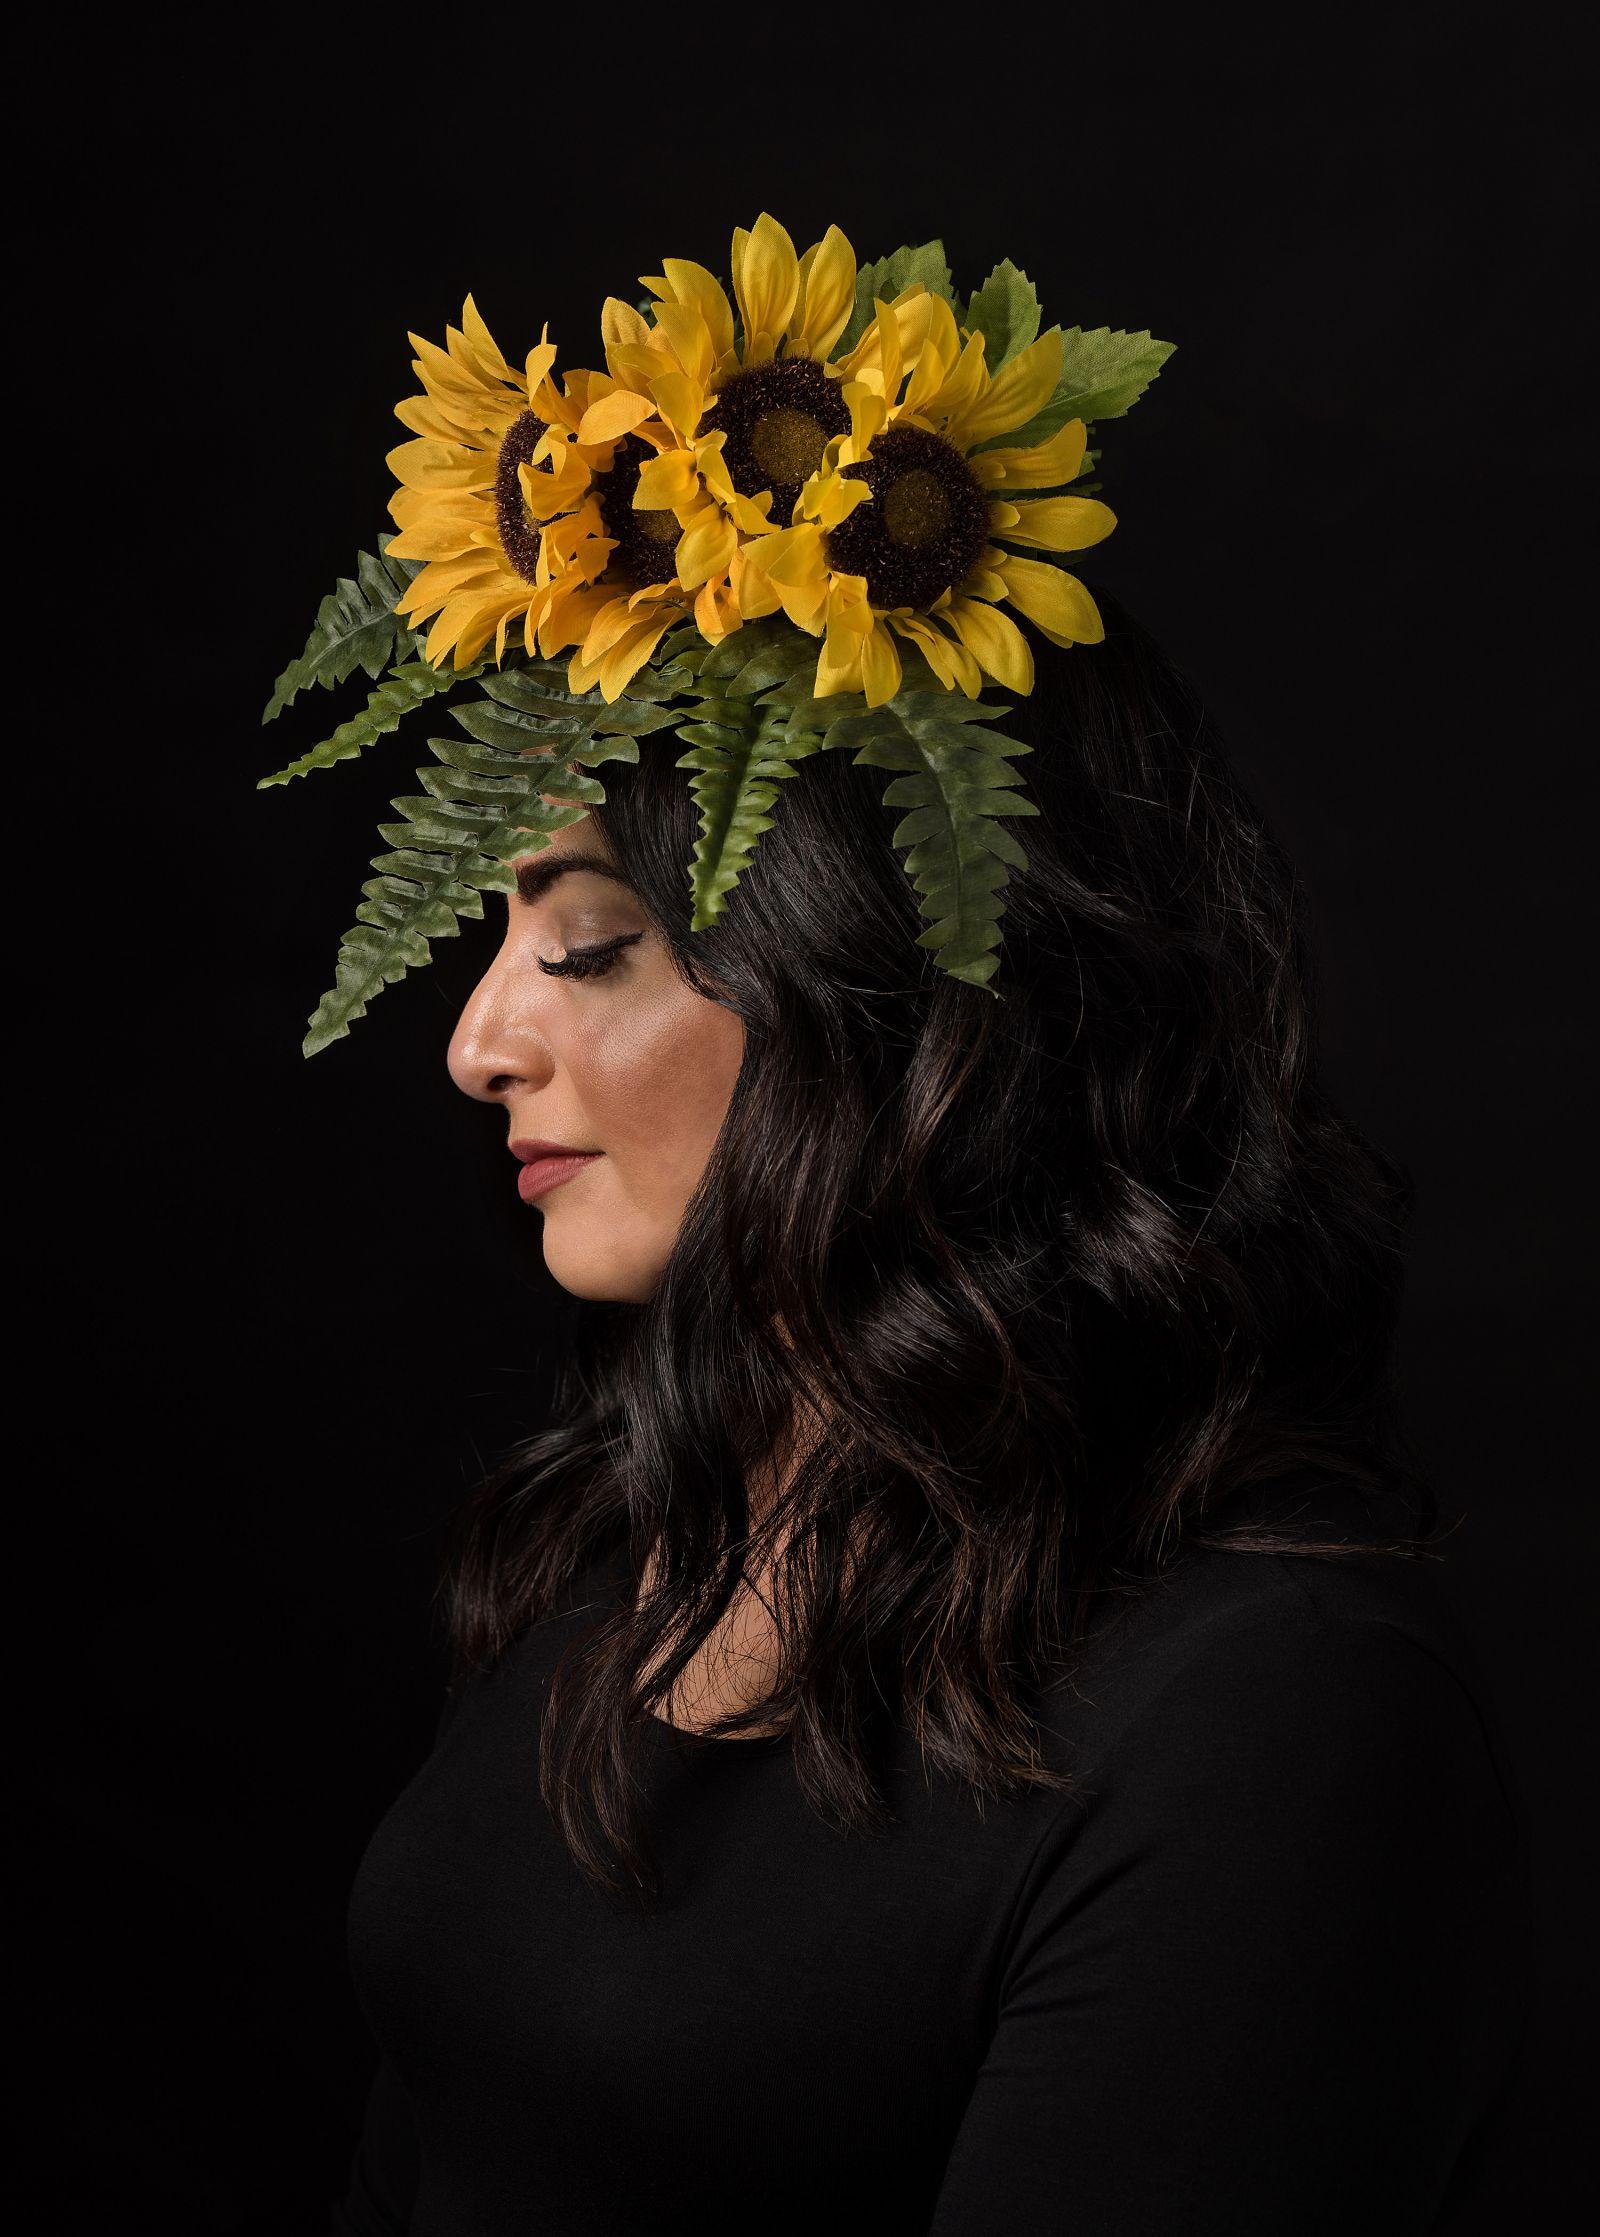 fine art portrait sunflowers